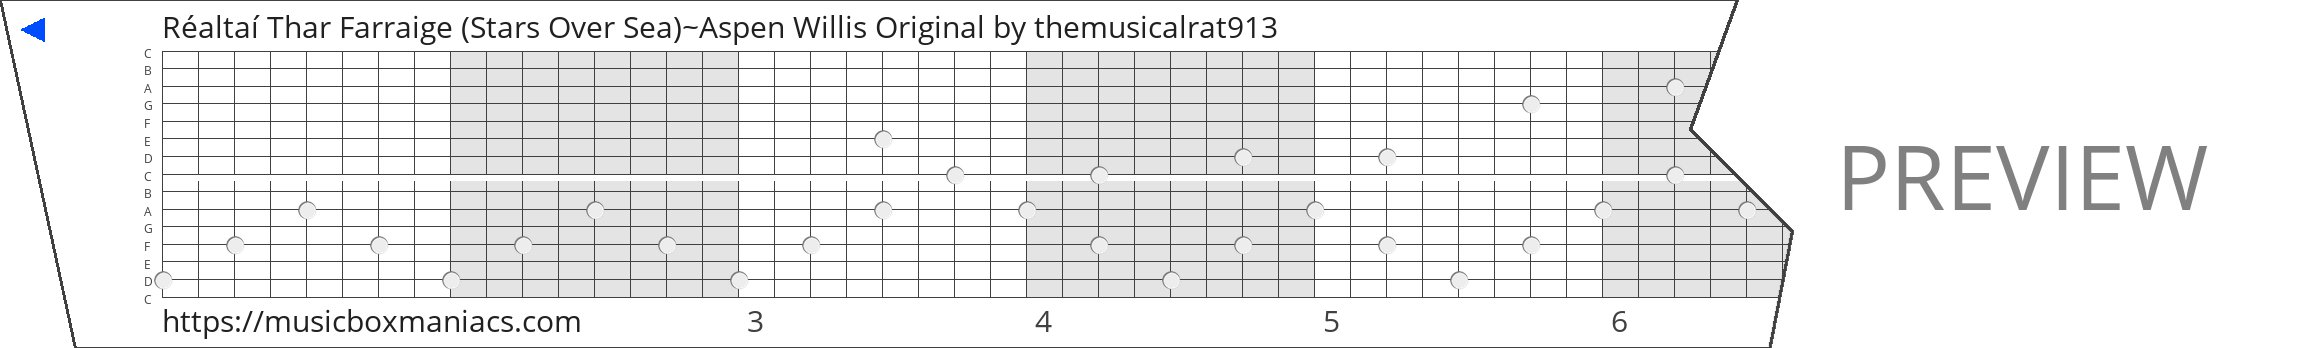 Réaltaí Thar Farraige (Stars Over Sea)~Aspen Willis Original 15 note music box paper strip